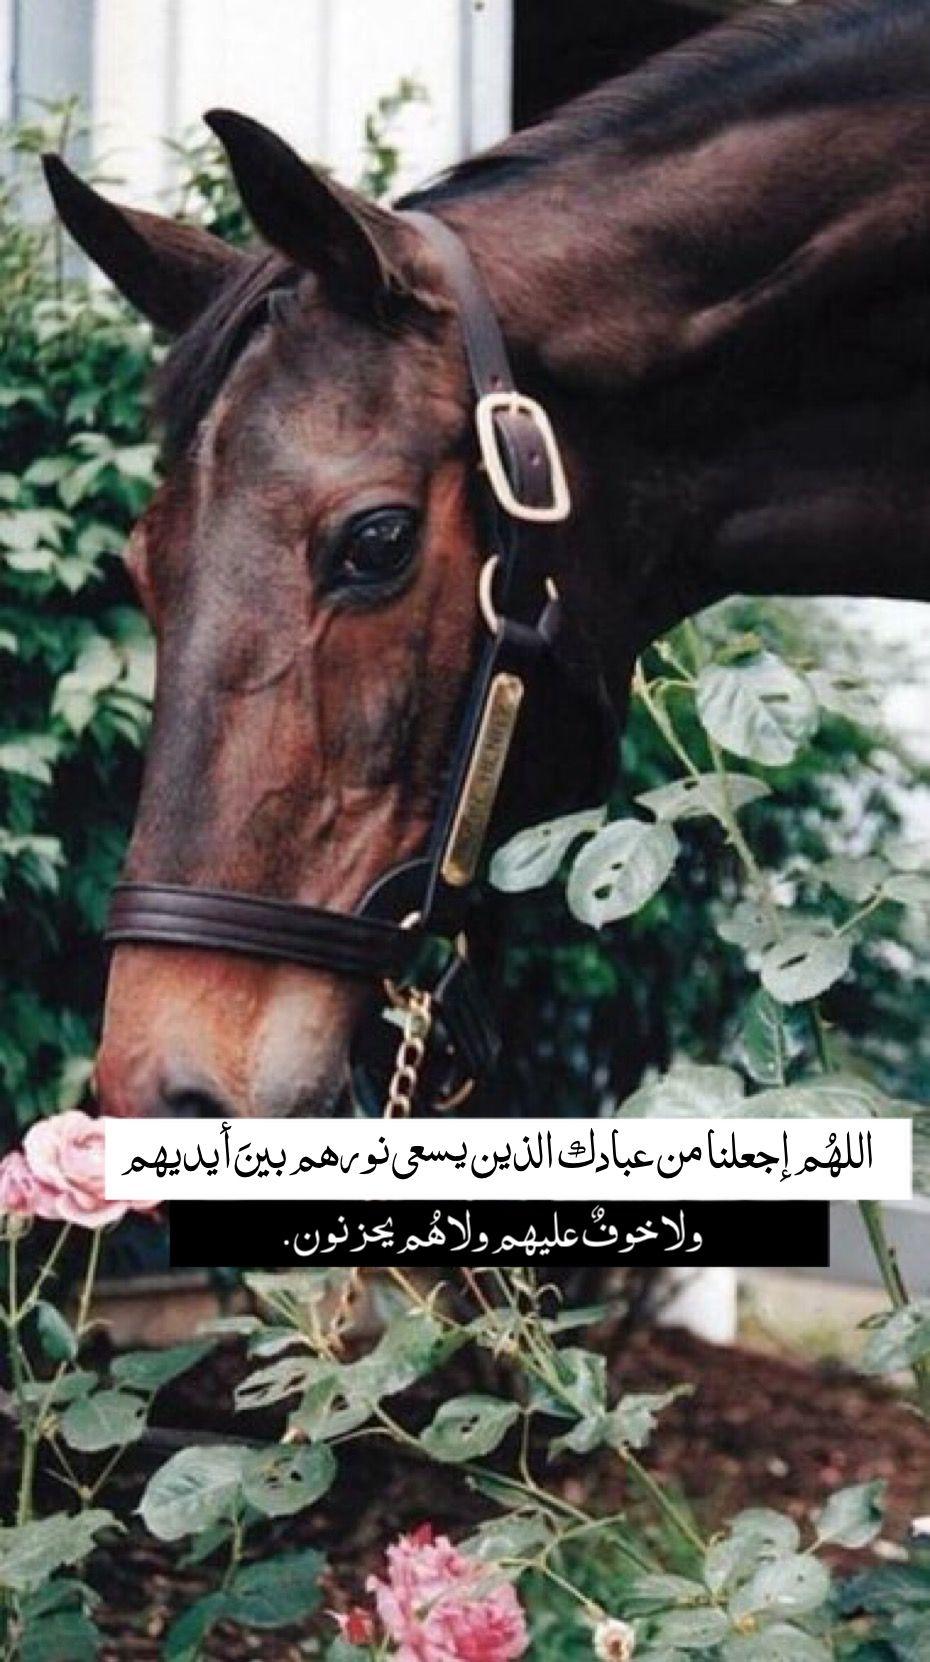 Pin By الوتين On خلفيات دينية Horses Animals Instagram